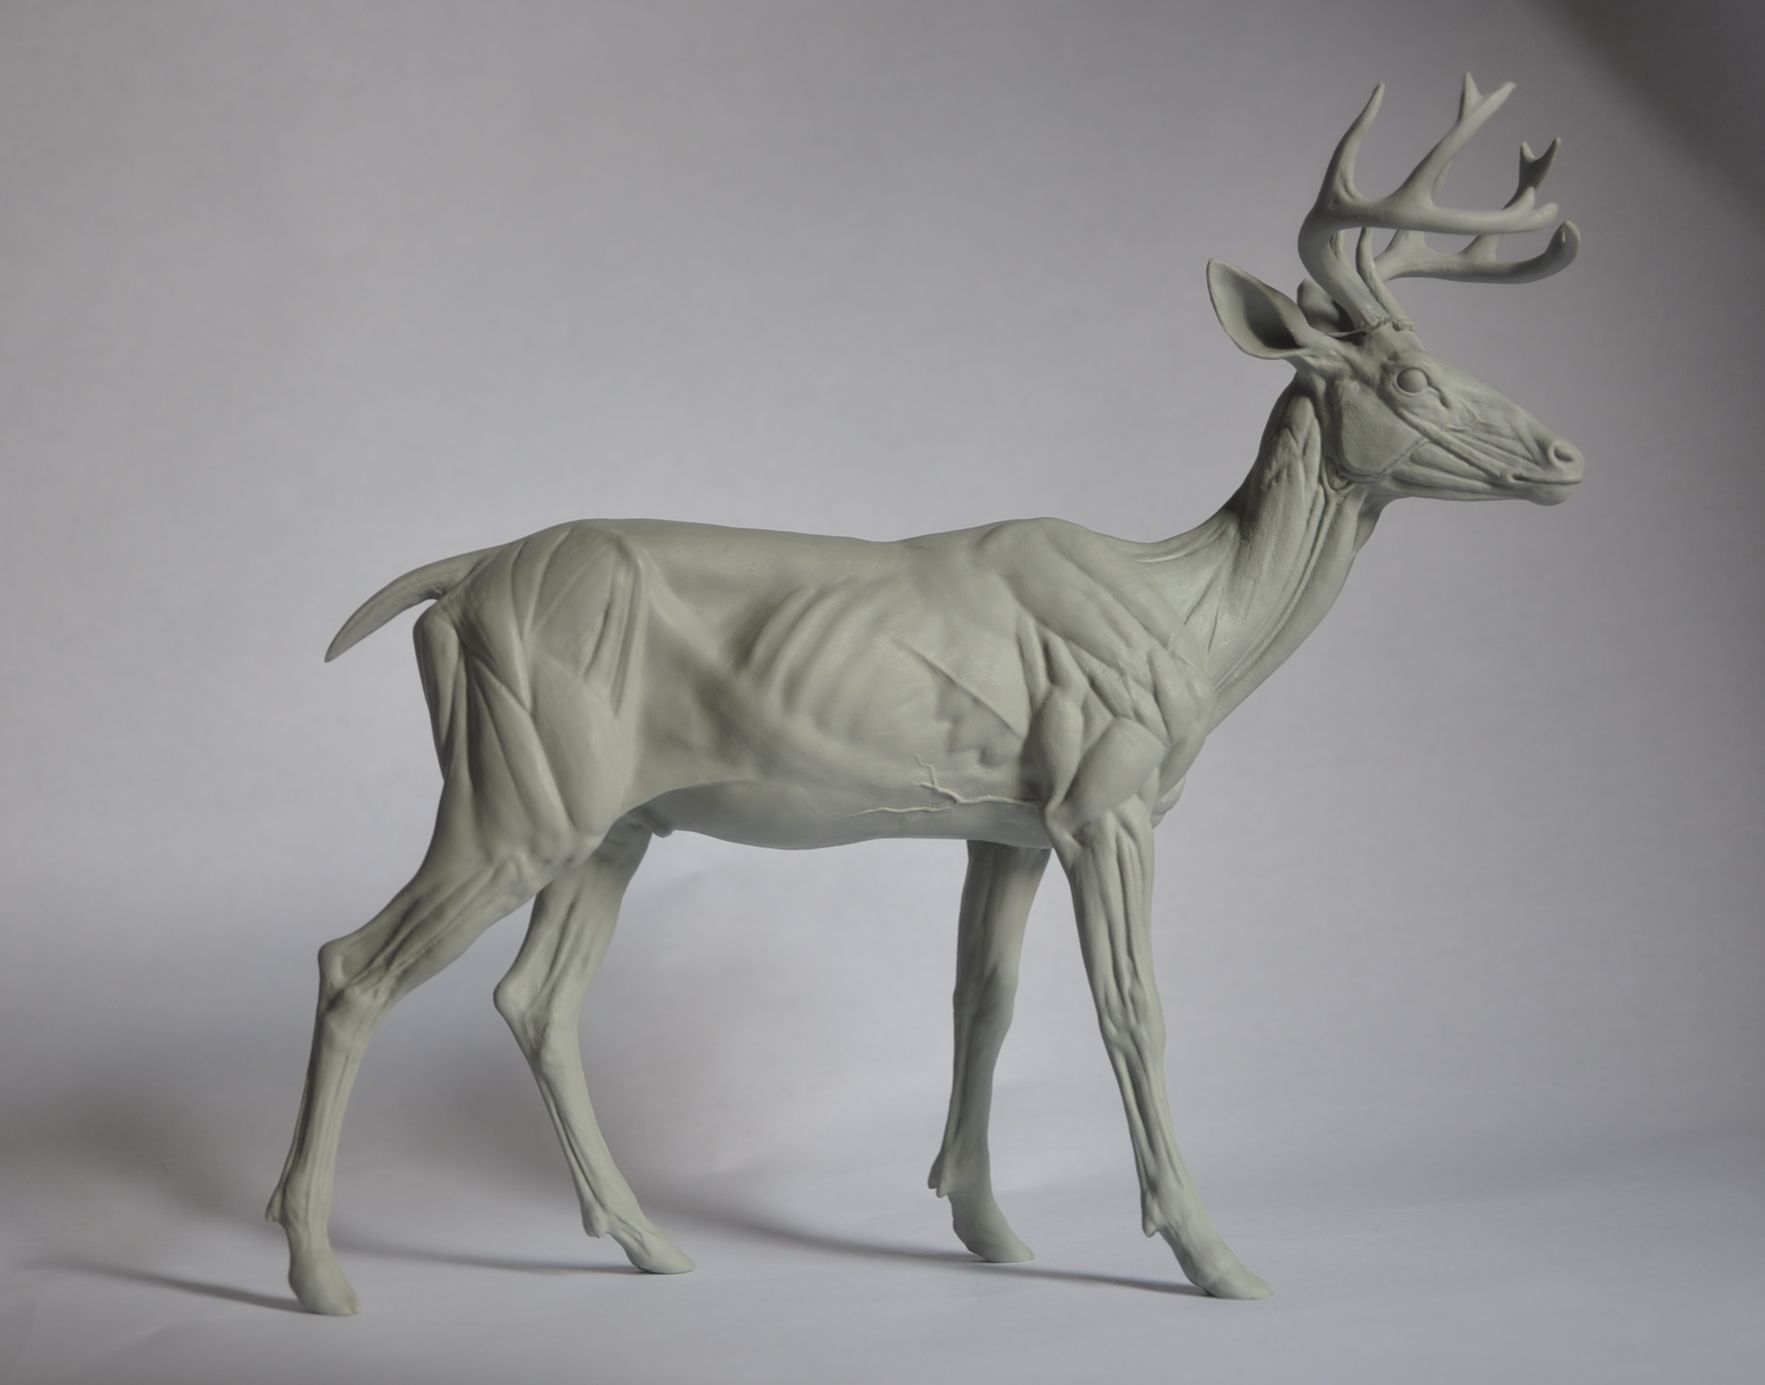 Deer Skeleton Anatomy Diagram 2004 Pontiac Grand Am Monsoon Wiring Whitetail Topsimages